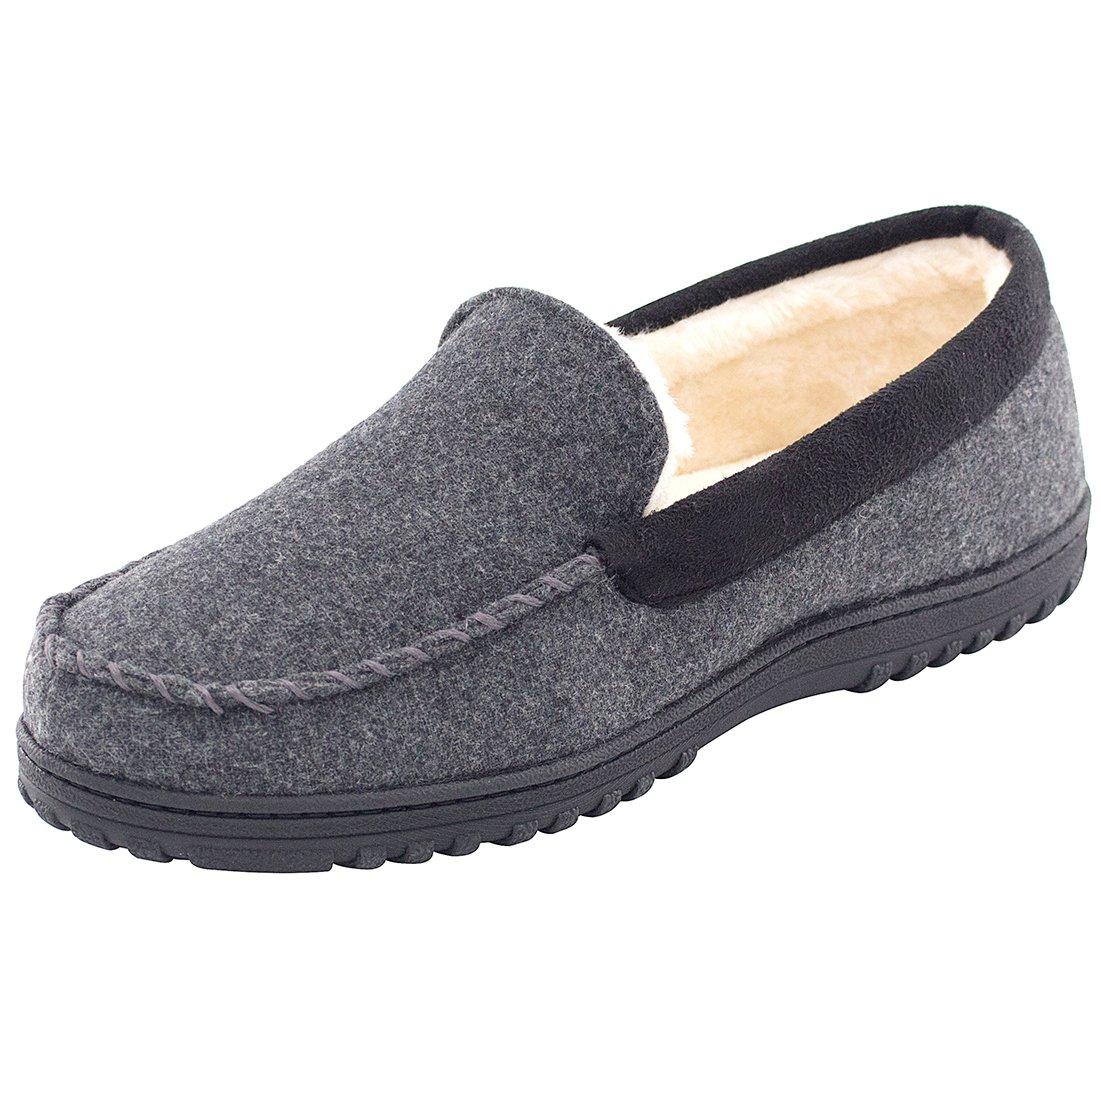 Men's Comfy & Warm Wool Micro Suede Plush Fleece Lined Moccasin Slippers House Shoes Indoor/Outdoor (43 (US Men's 10), Dark Gray)